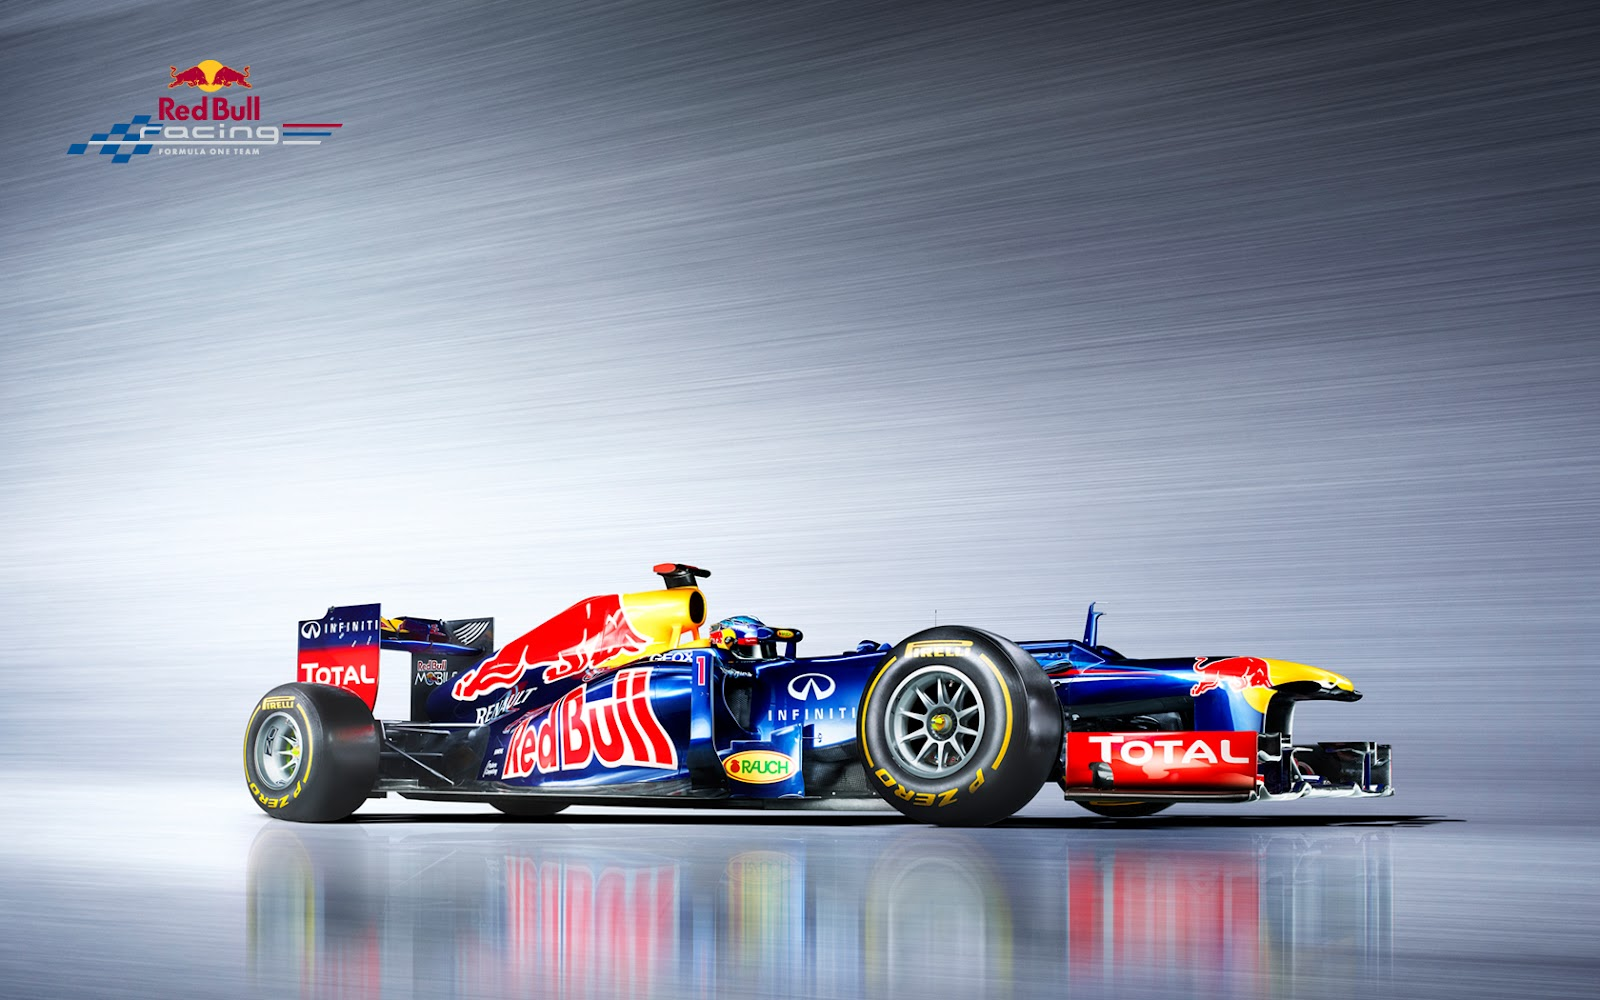 http://3.bp.blogspot.com/-VmEh5fzBT54/UBEHT4r5nuI/AAAAAAAABx8/rDxwOCuePeA/s1600/RB8+Vettel+2012.jpg